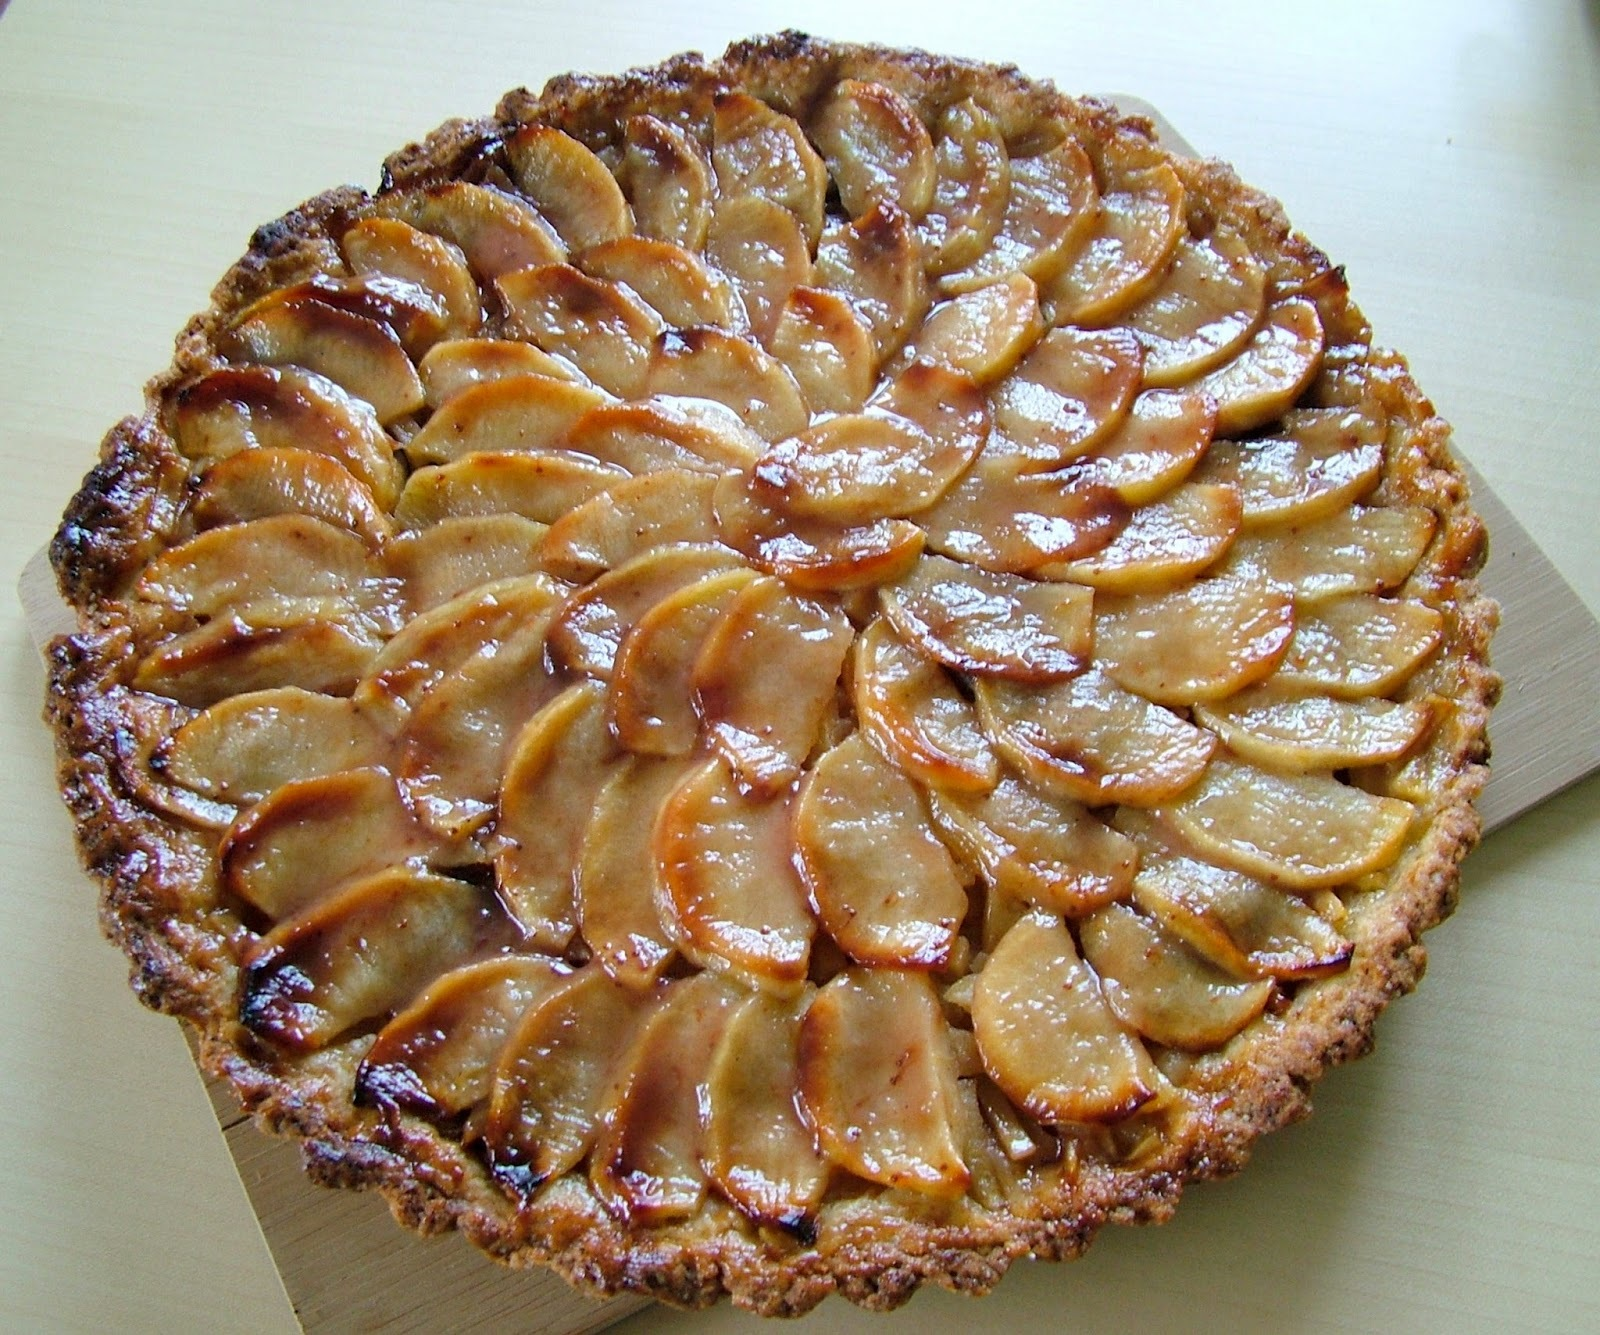 francuzsky jablkovy kolac s karamelom